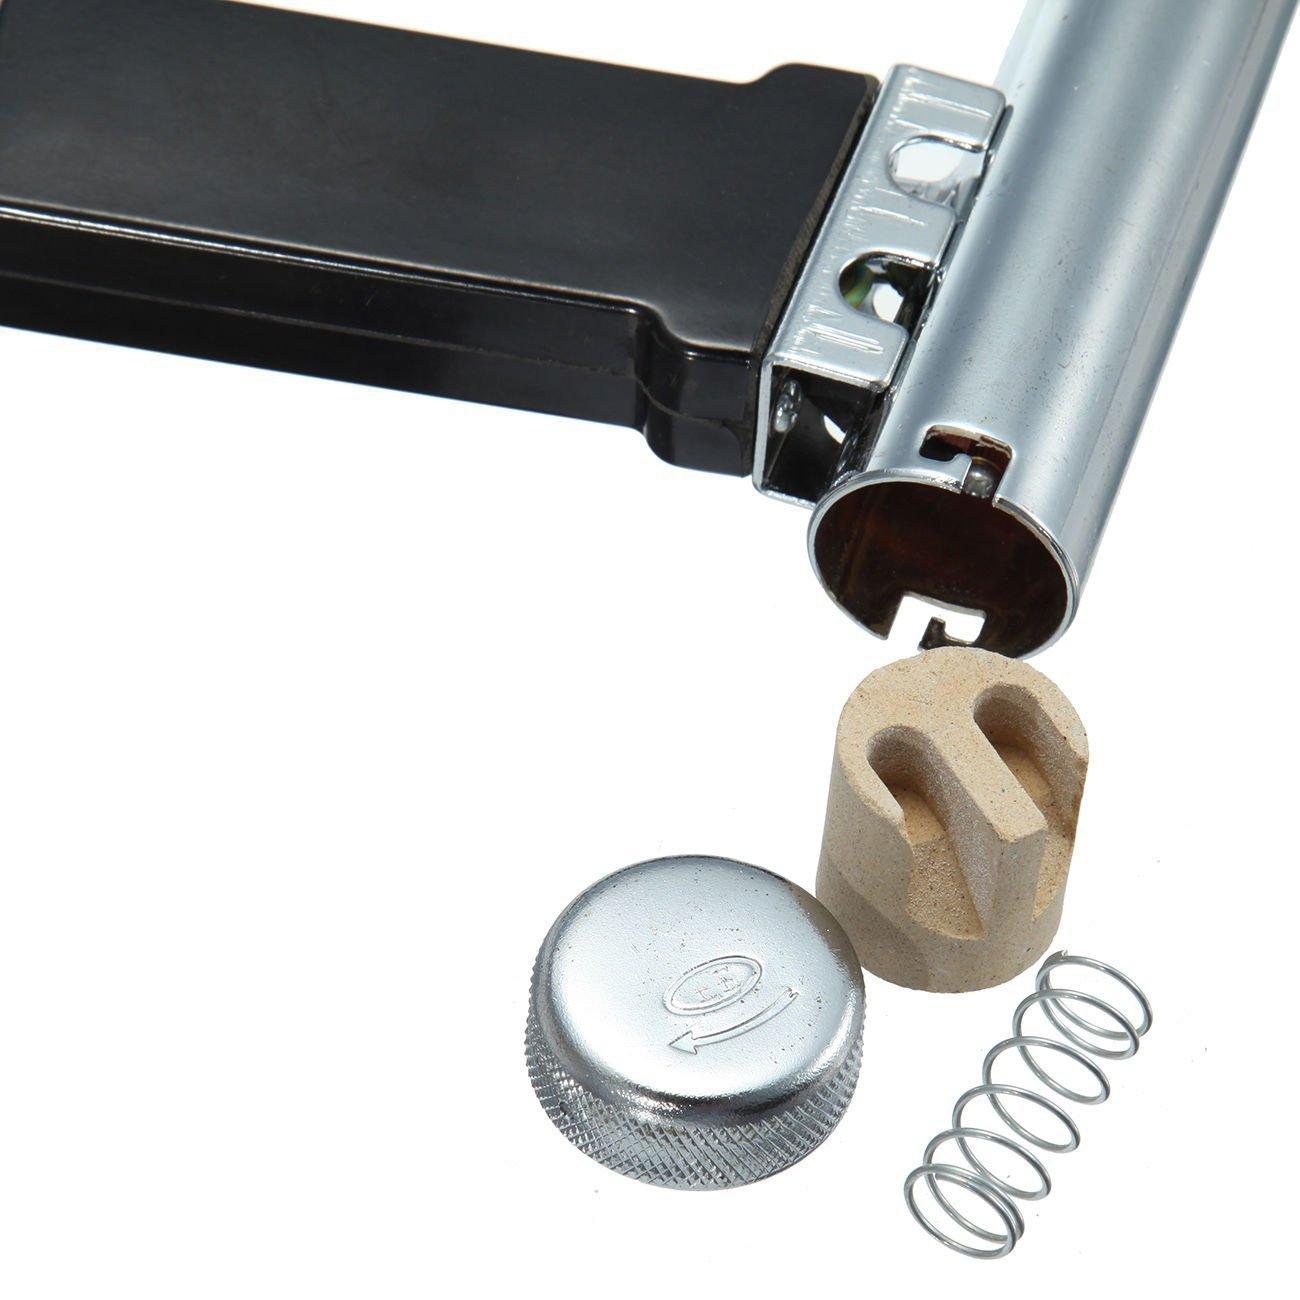 Beyondlife 1080W Split Plastic Welder Welding Tool Heat Heating Gun Torch Hot Air Pistol PVC Welder Machine Tool Kit, with 1.5 meters hose (Lightweight, Flexible)